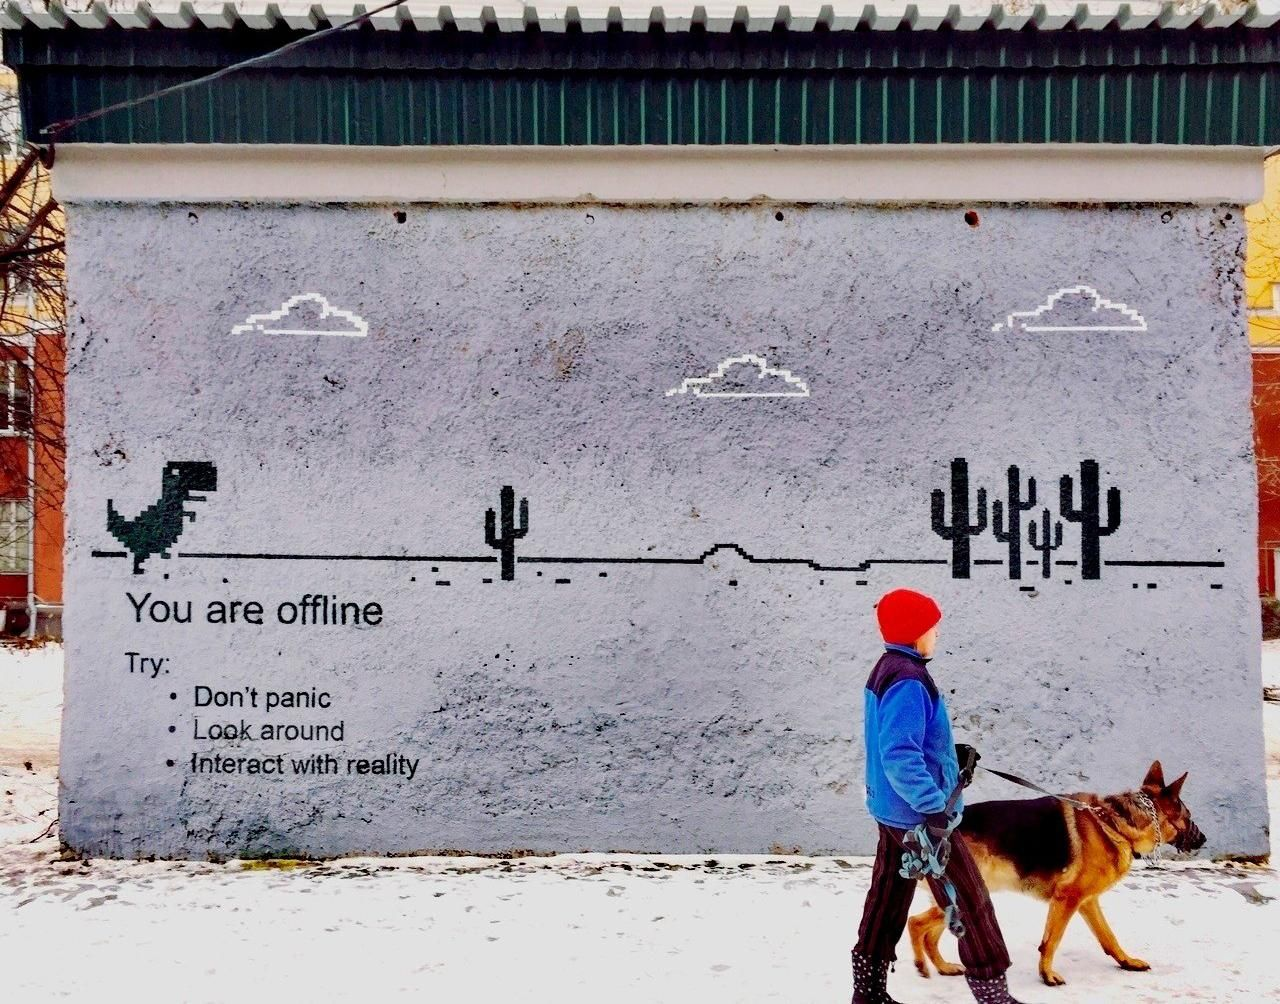 This graffiti